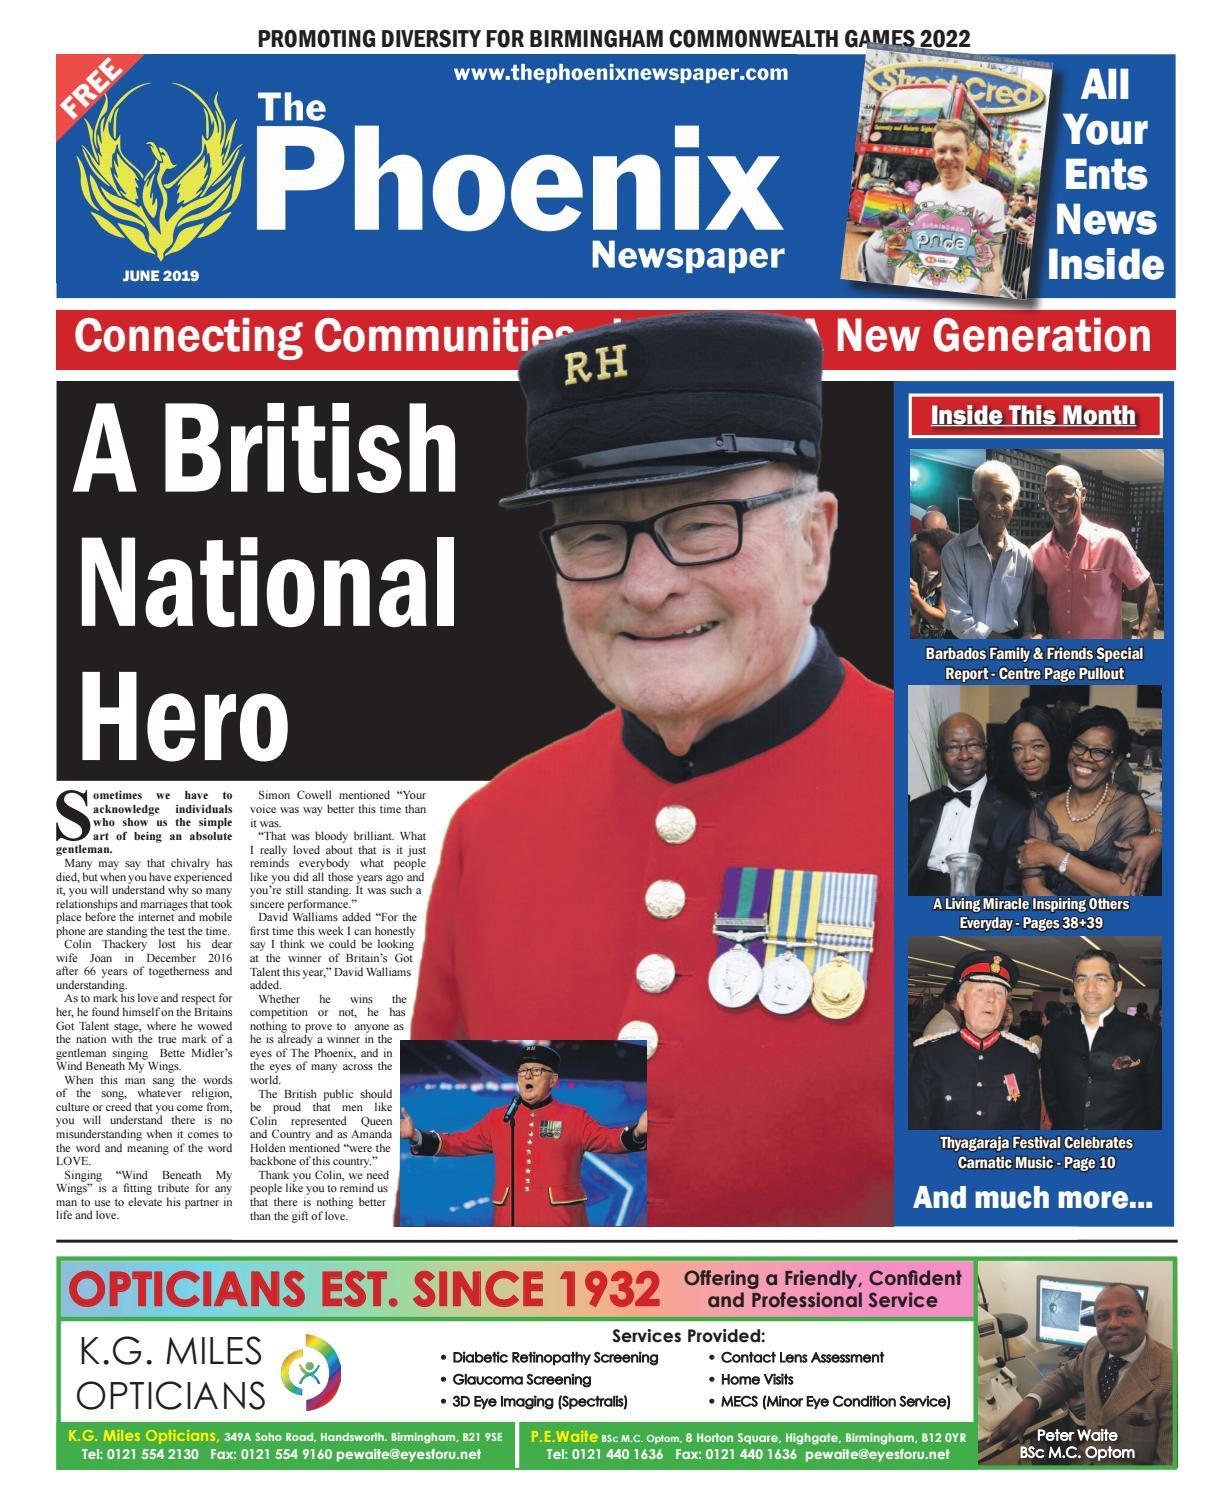 The Phoenix Newspaper - June 2019 by The Phoenix Newspaper